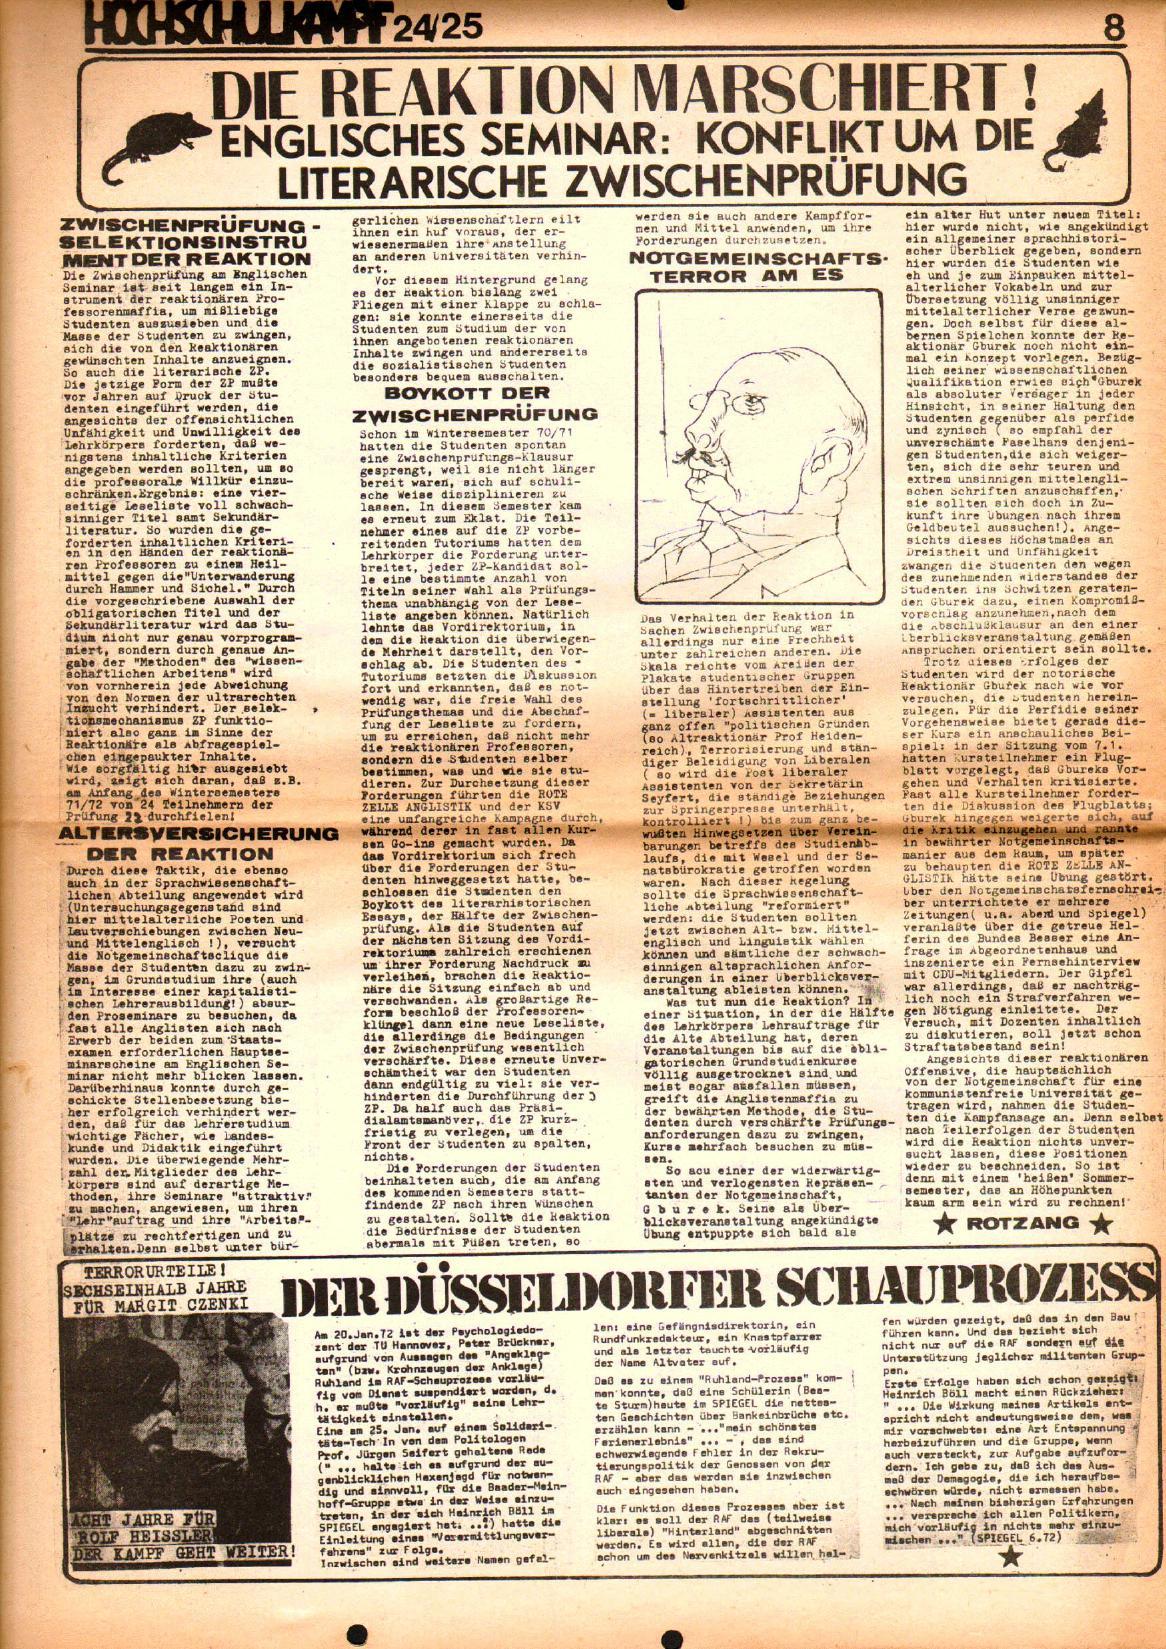 Berlin_Hochschulkampf_1971_24_08